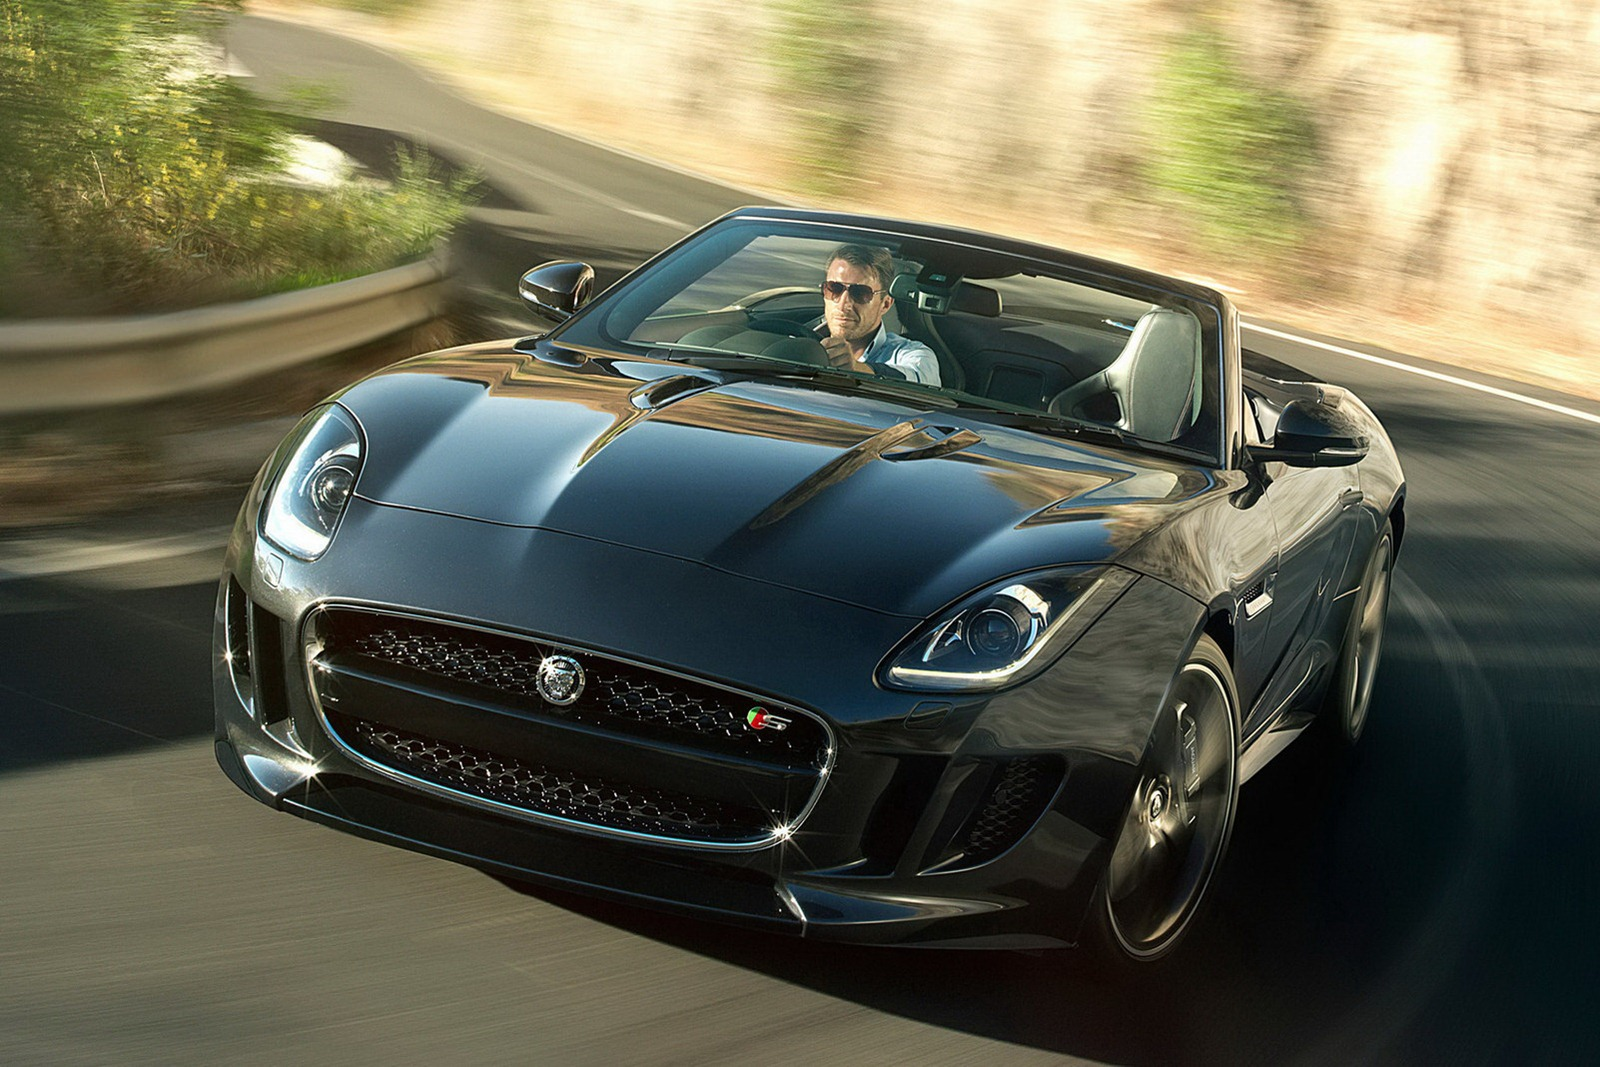 jaguar f type officially unveiled autoevolution. Black Bedroom Furniture Sets. Home Design Ideas